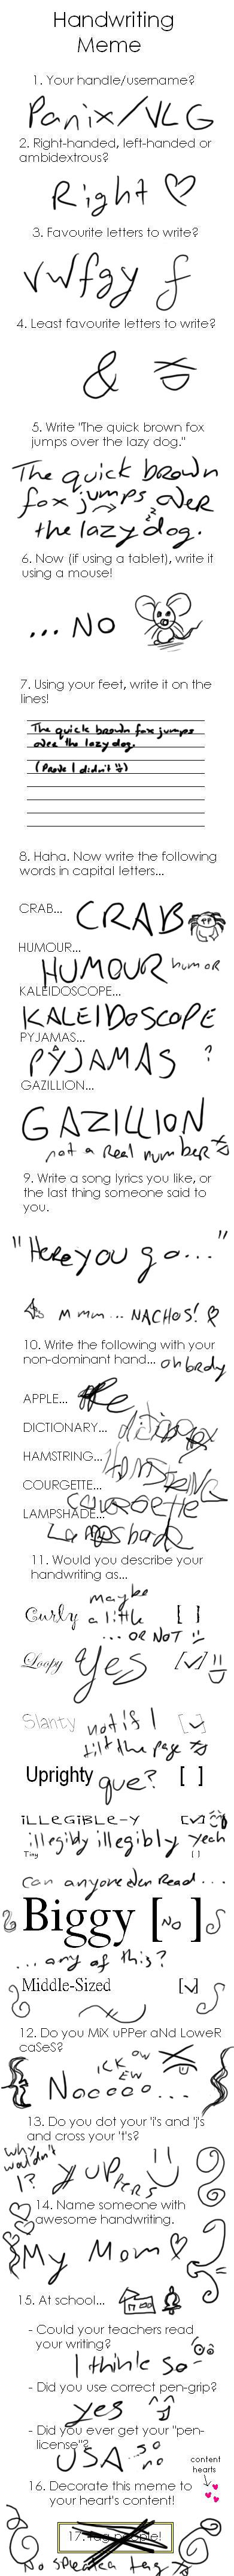 Handwriting Meme by InstantCoffeeBarista